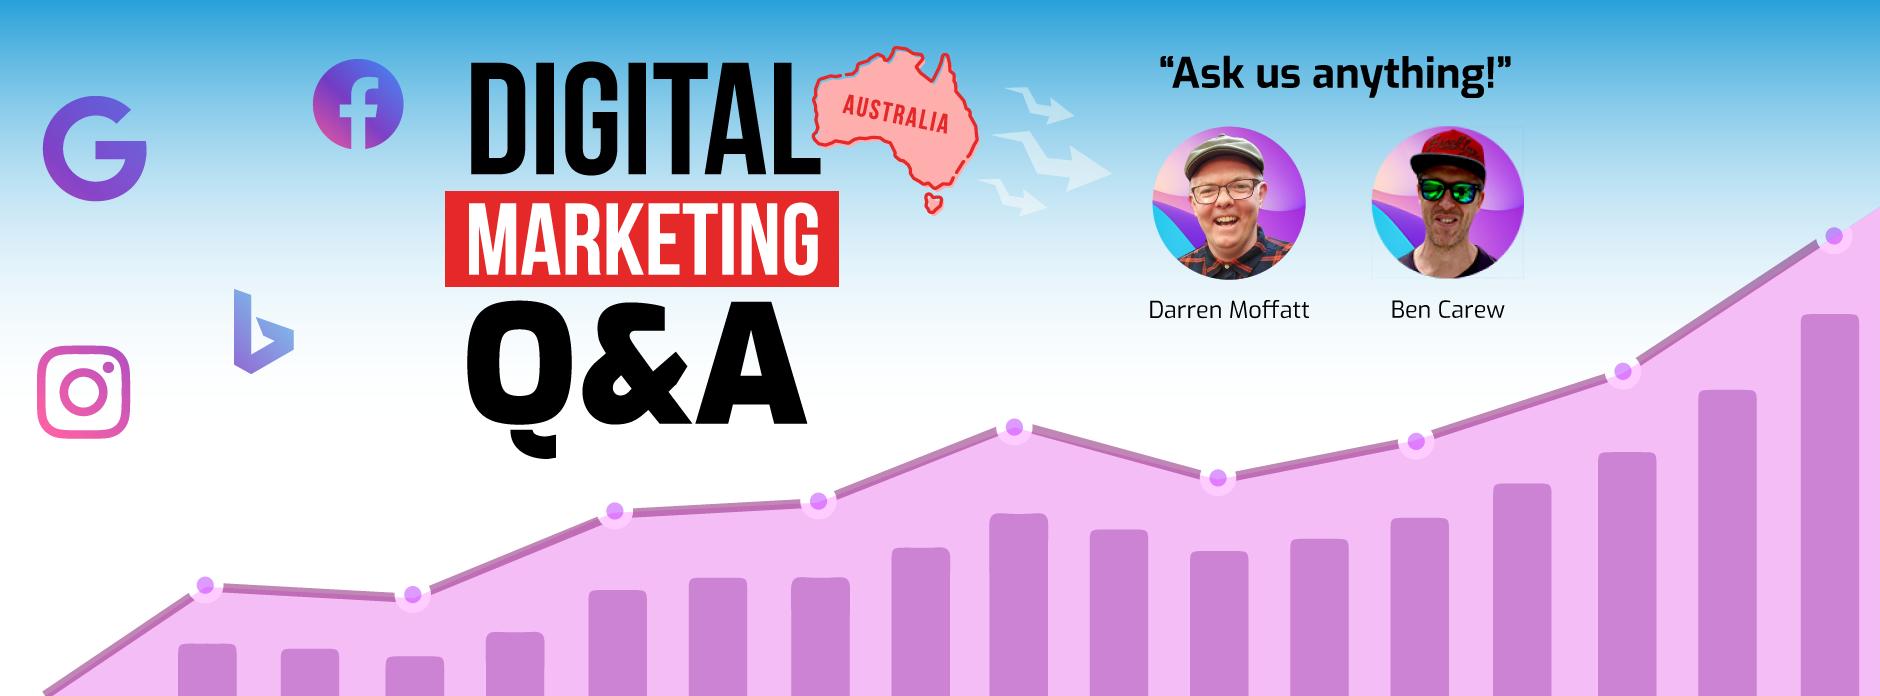 digital marketing facebook group australia